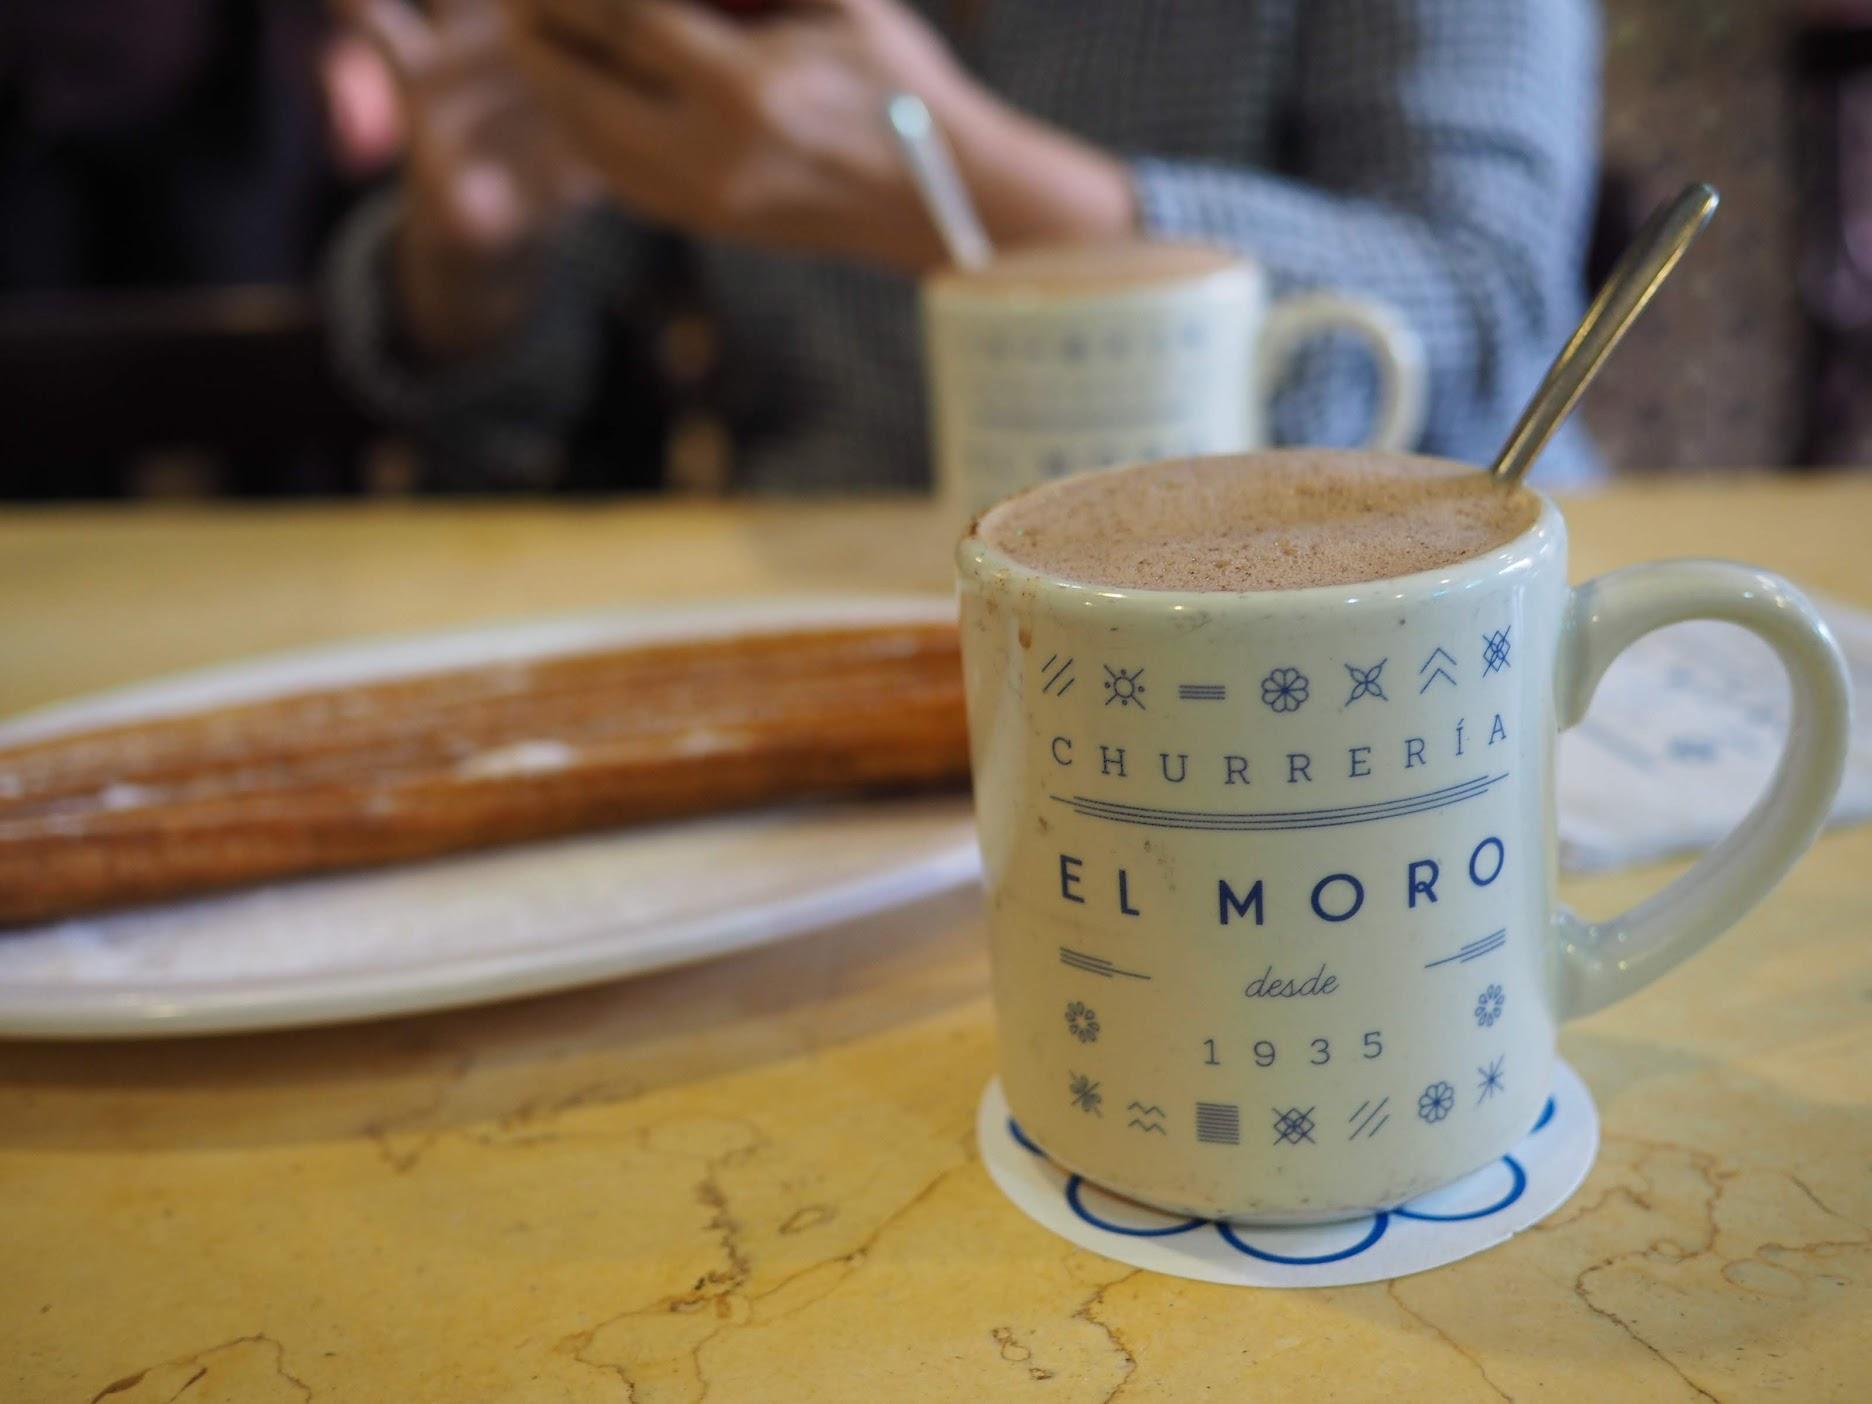 El More: 24 hour churreria in Mexico City